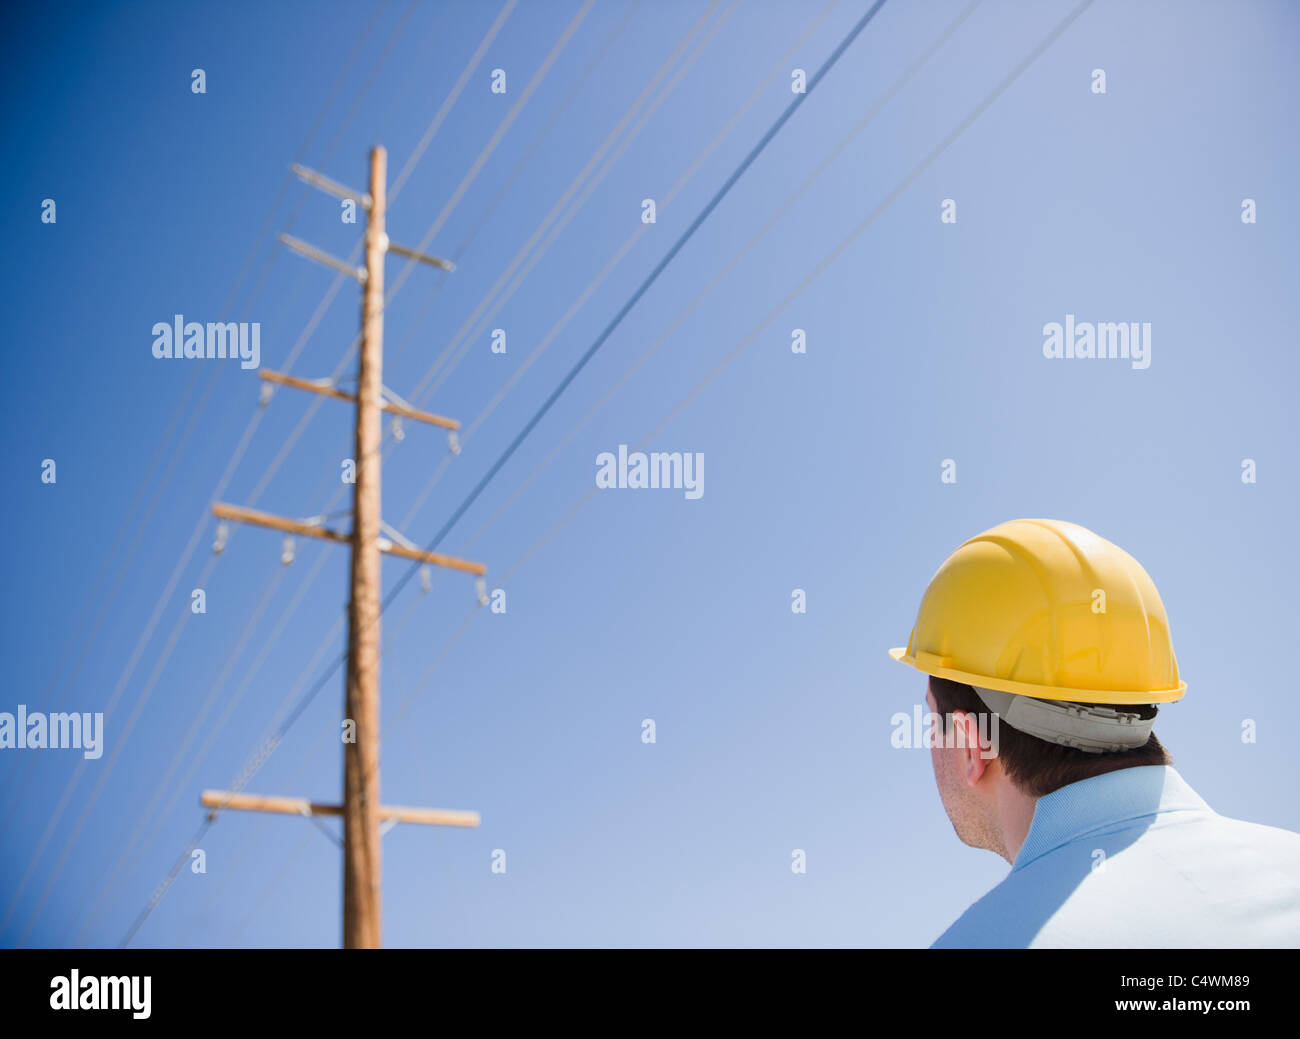 USA, California, Palm Springs, Coachella Valley, San Gorgonio Pass, Man in hard hat looking at telephone pole - Stock Image